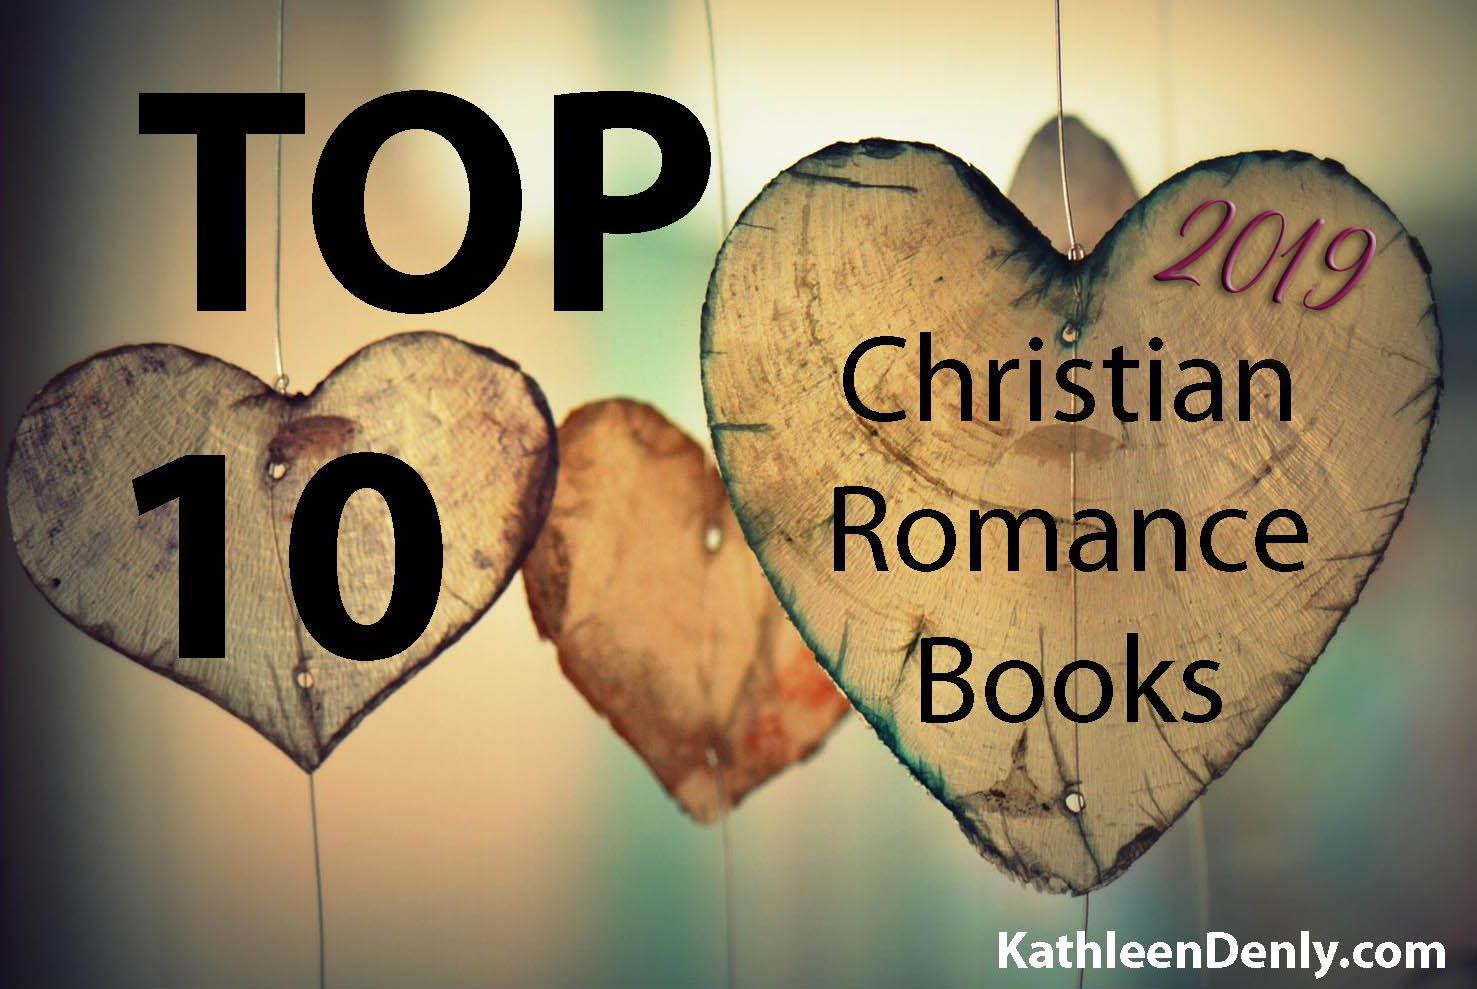 Top 10 Christian Romance Books Blog Post Image